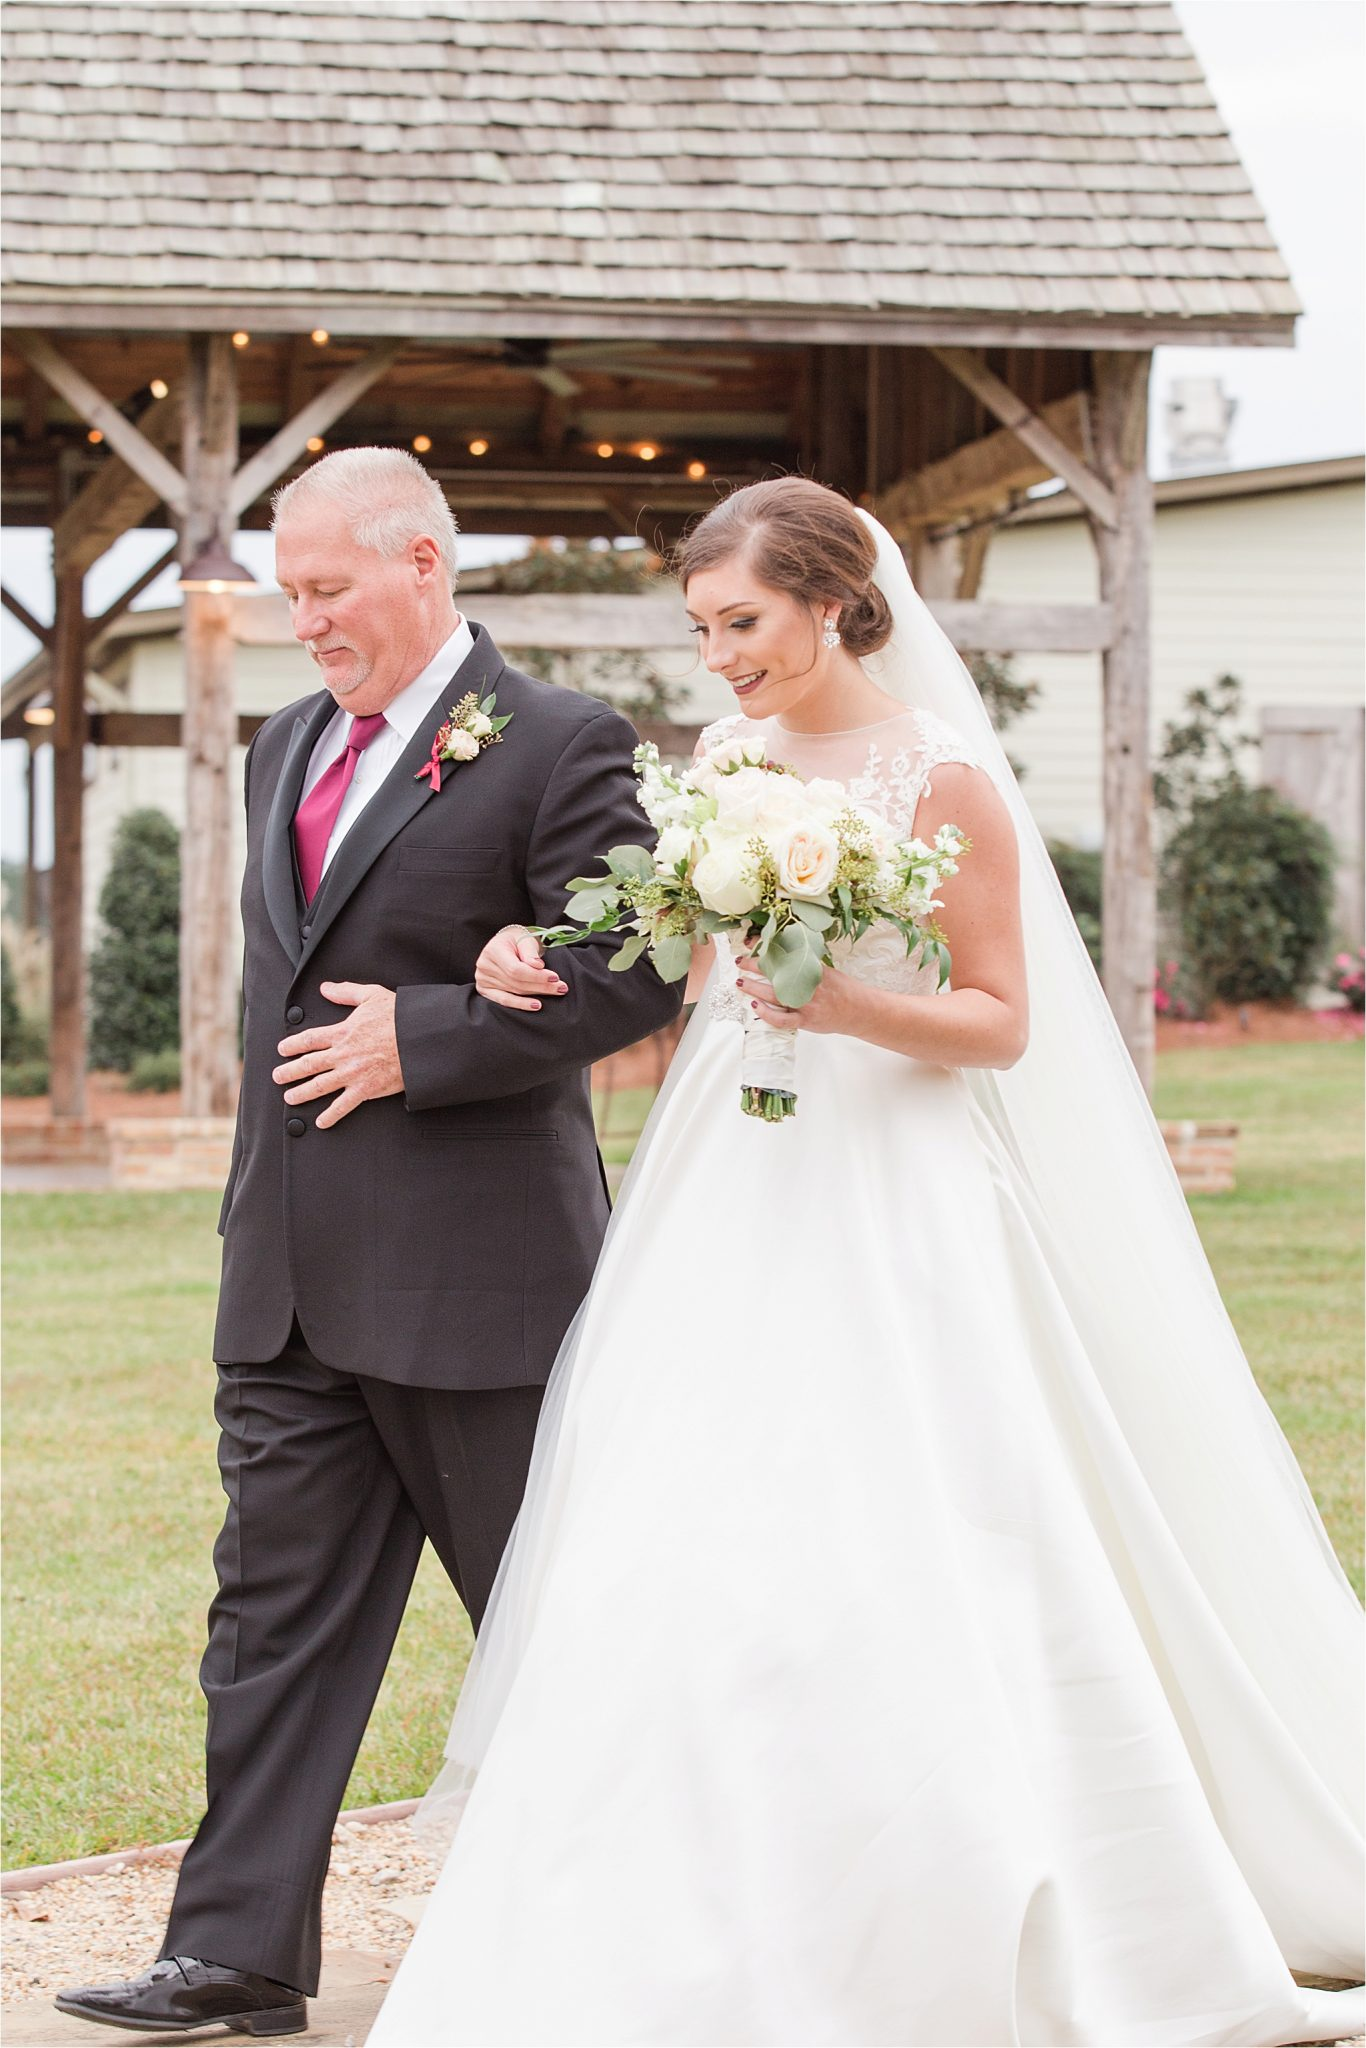 The Barn at Bridlewood Wedding-Hattiesburg, Mississippi-Kelsey + Blake-Wedding details-Barn wedding-Ruby wedding-Autumn themed wedding-Wedding dress-Wedding florals-Bridal shoot-Father and daughter